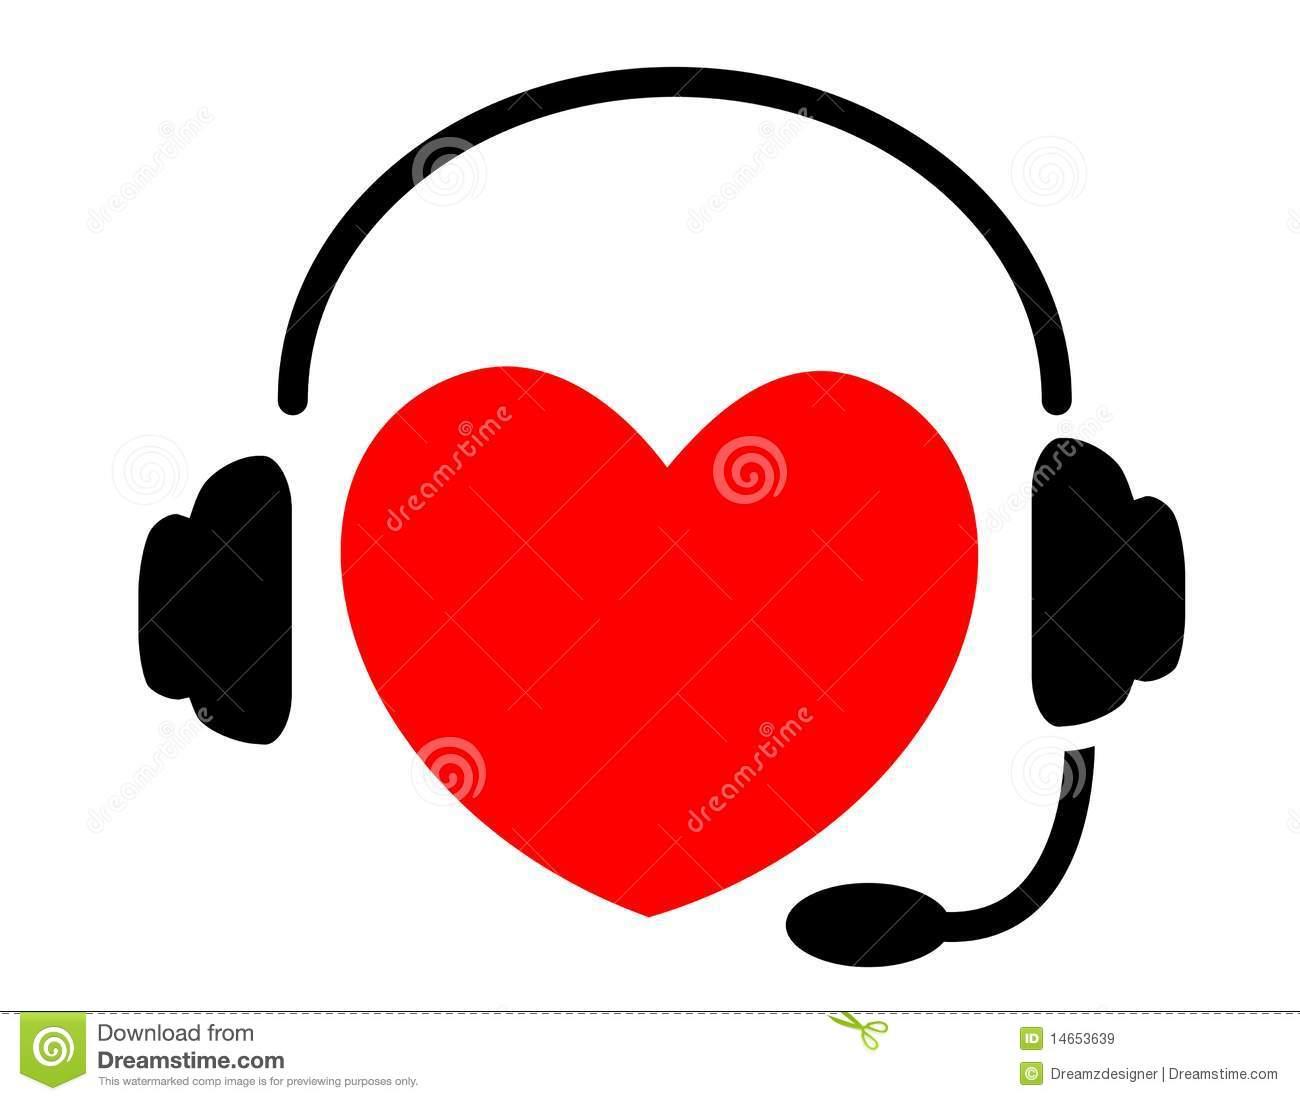 Headphone clipart music heart Clipart Clipart Clipart Heart Music